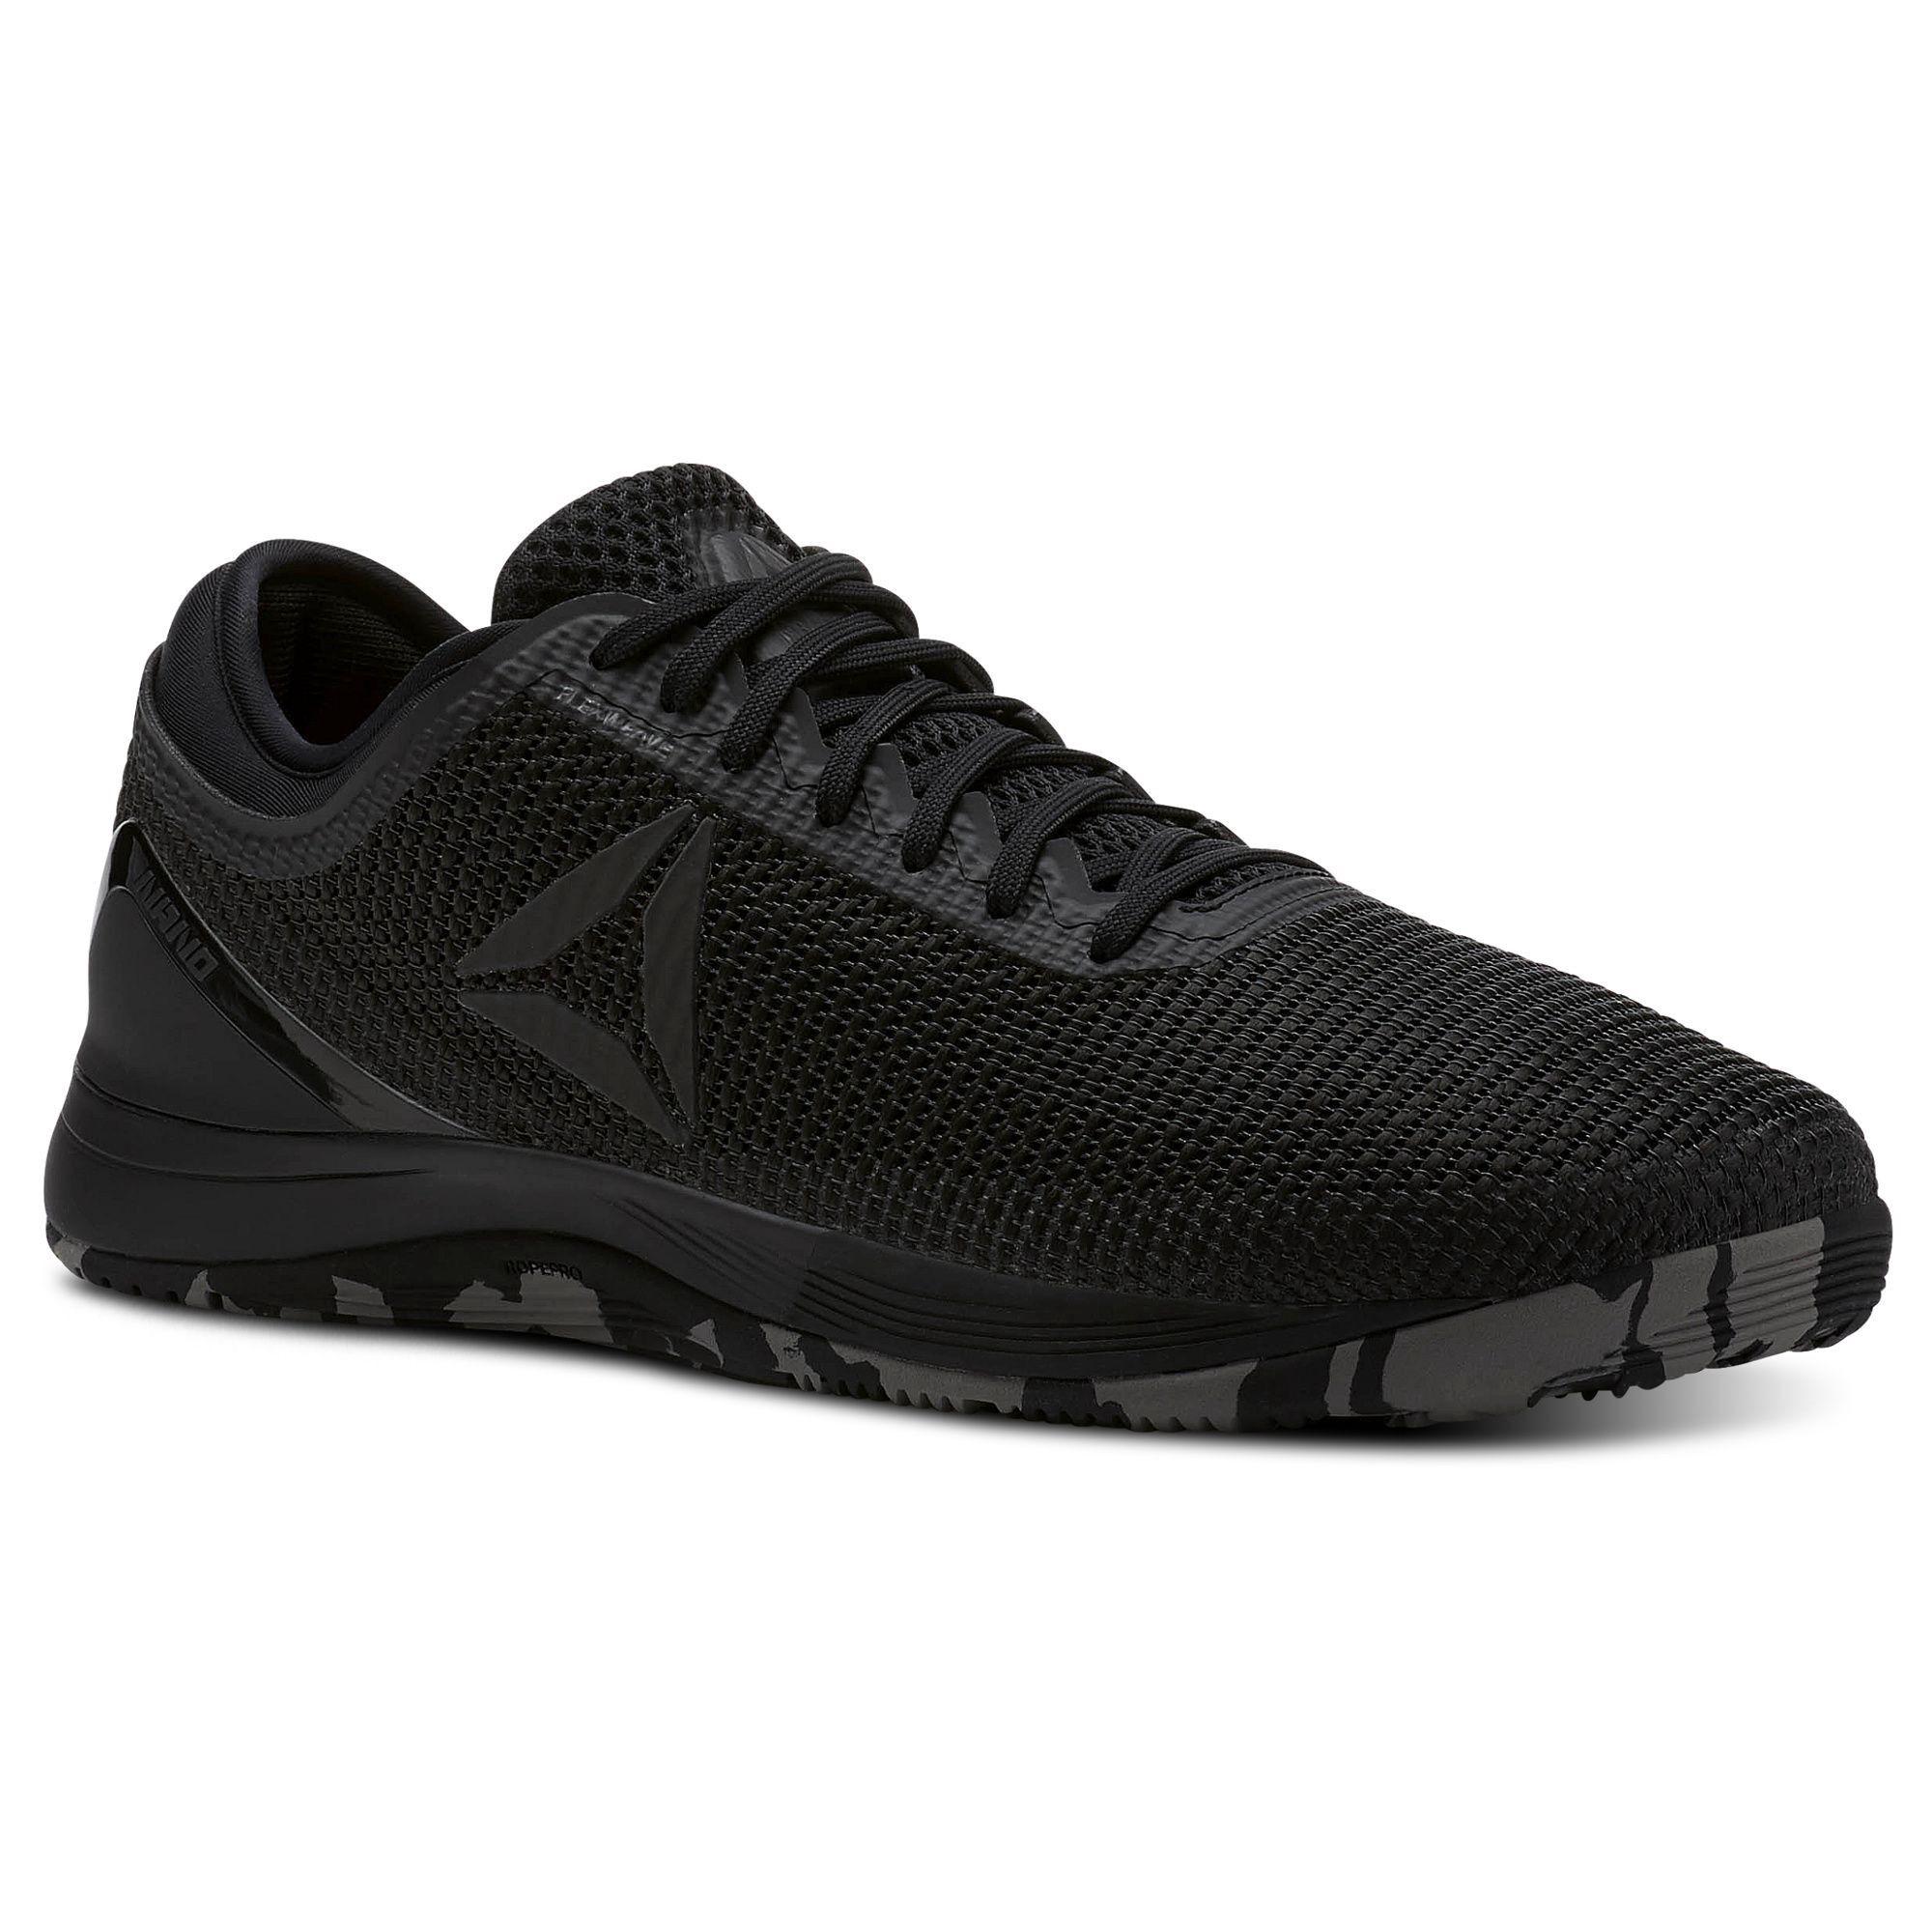 Reebok Crossfit Nano 8 Flexweave 9 Reebok Crossfit Reebok Zapatos